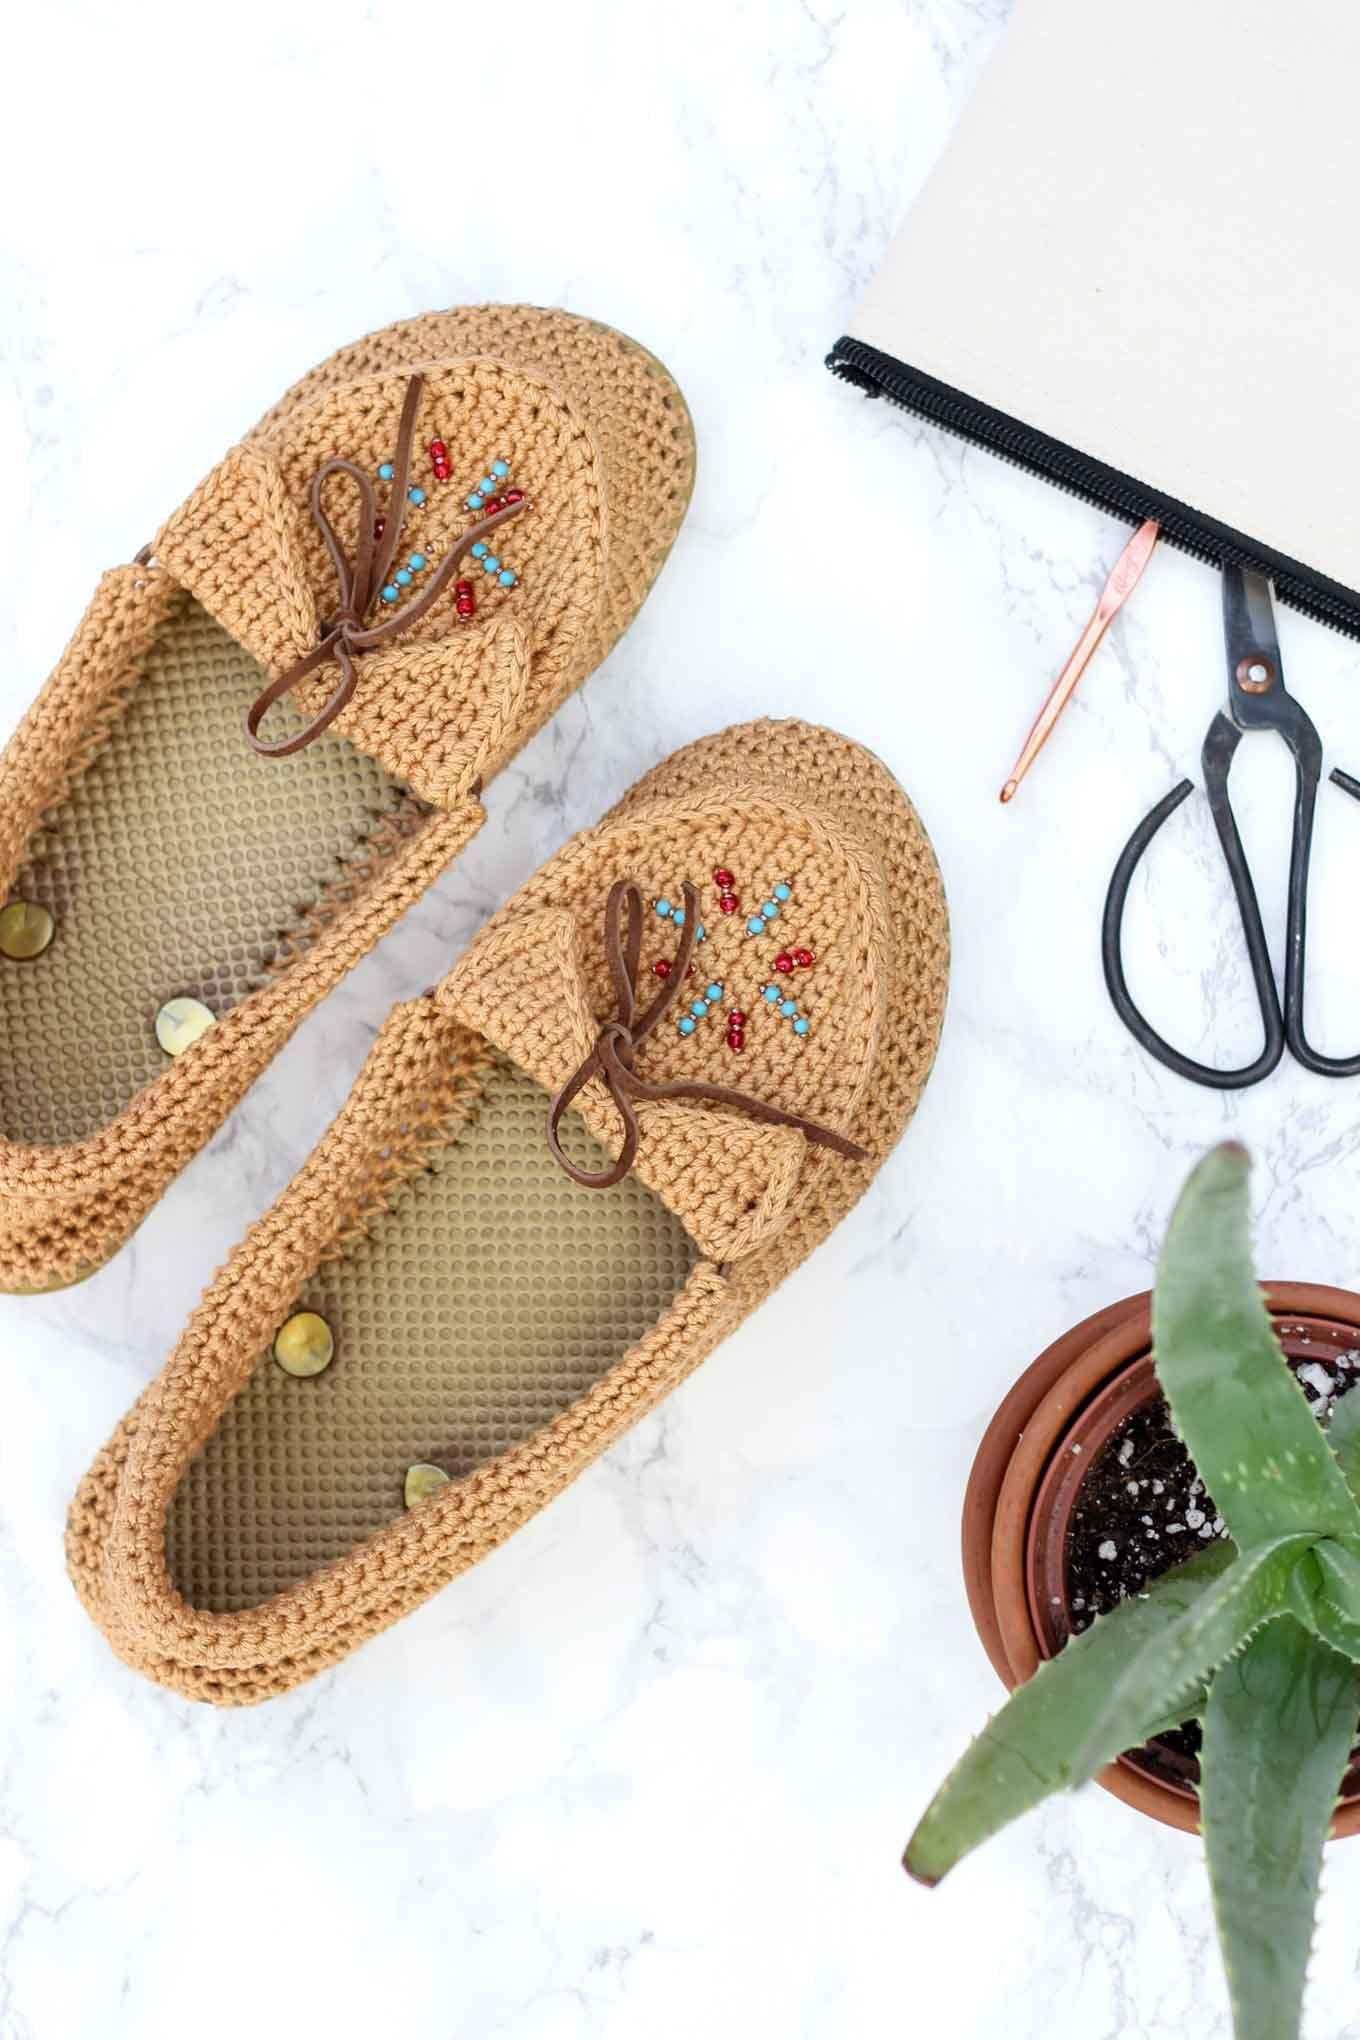 Crochet shoes with flip flop soles free moccasin pattern crochet shoes with flip flop soles free moccasin pattern bankloansurffo Gallery